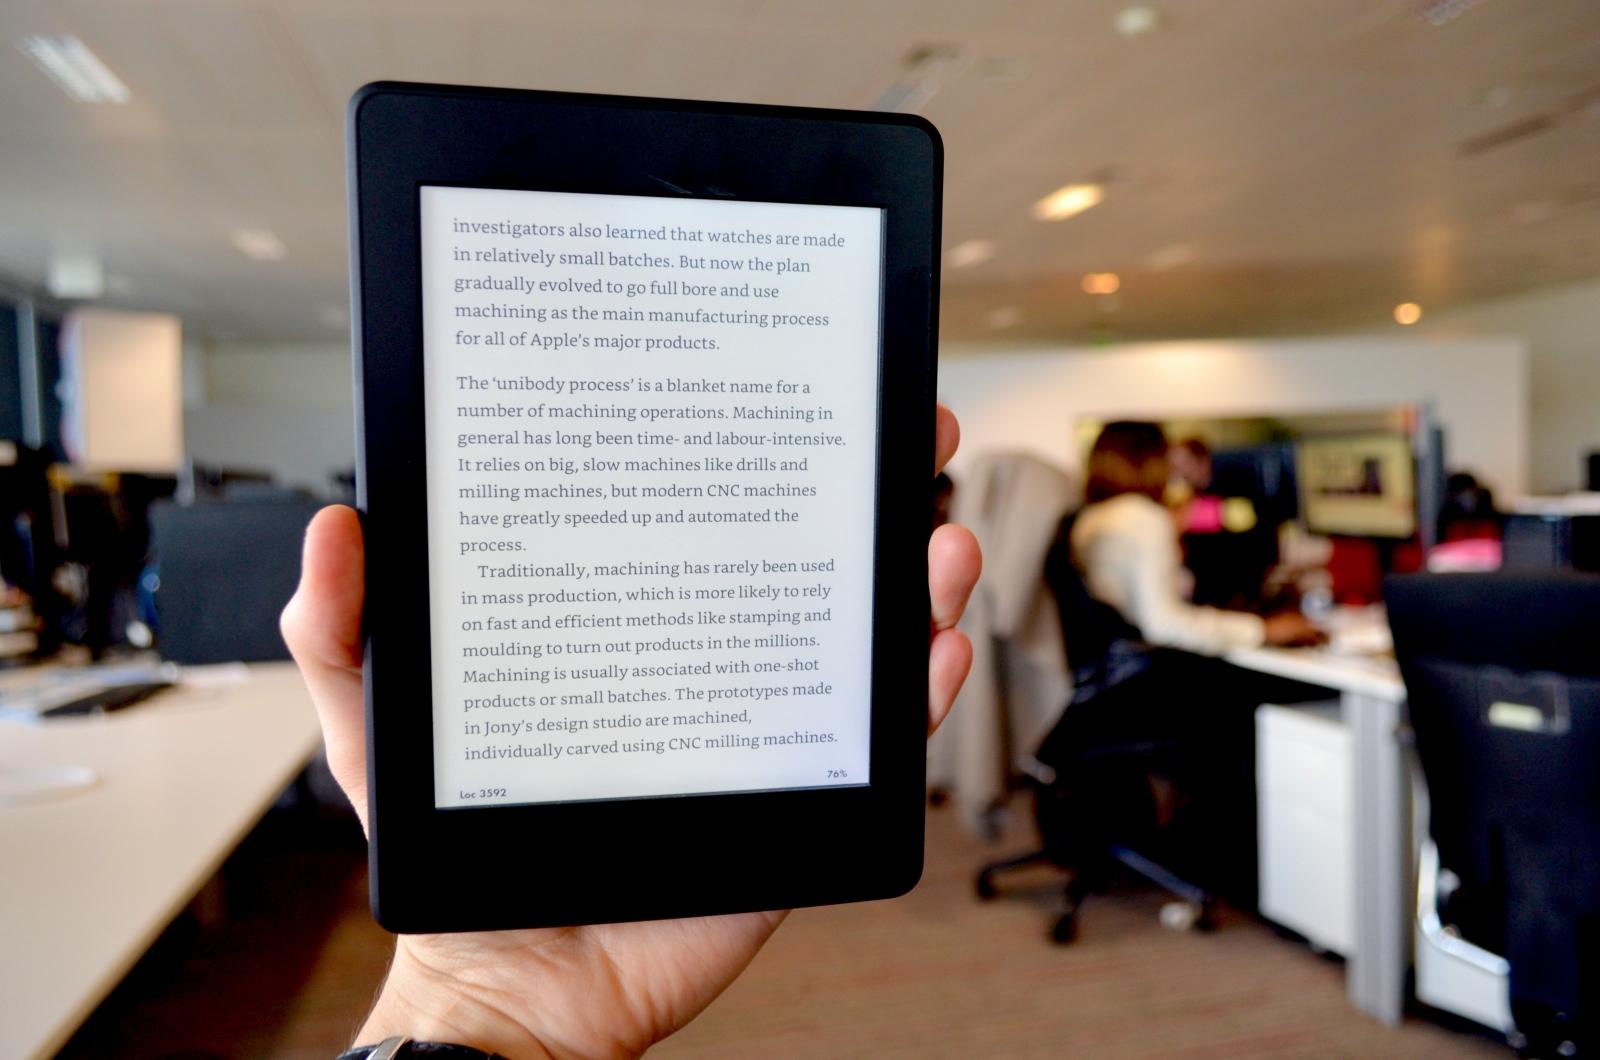 Amazon Kindle Paperwhite (2015)